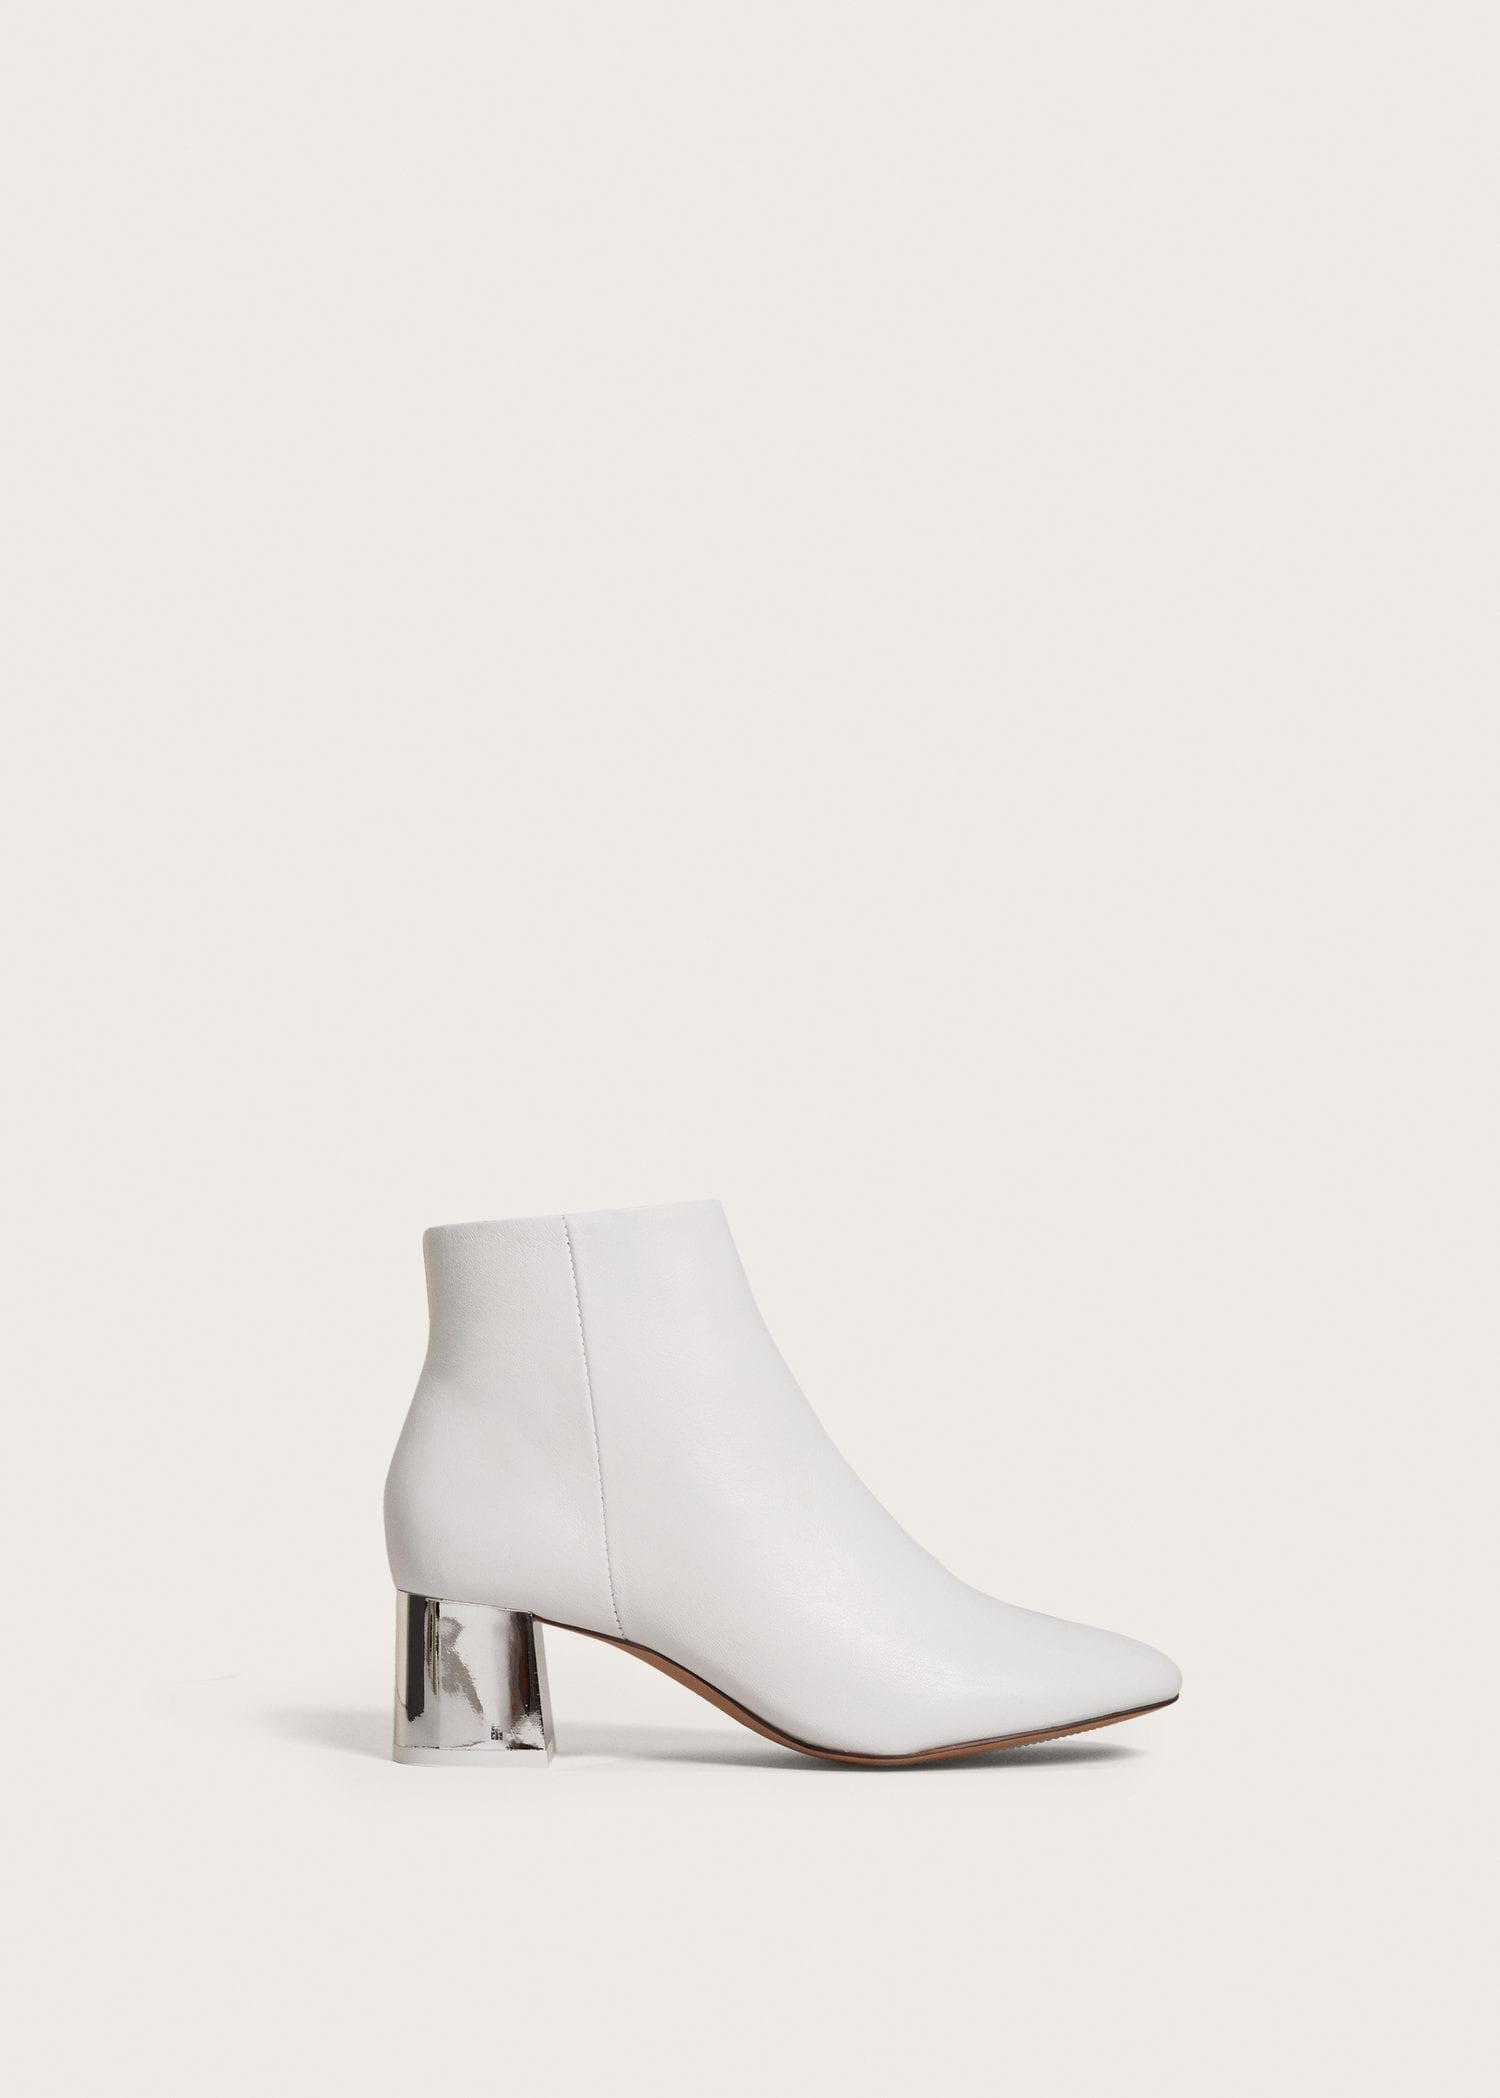 MANGO Metallic heel leather ankle boots iQbv6AjKI0